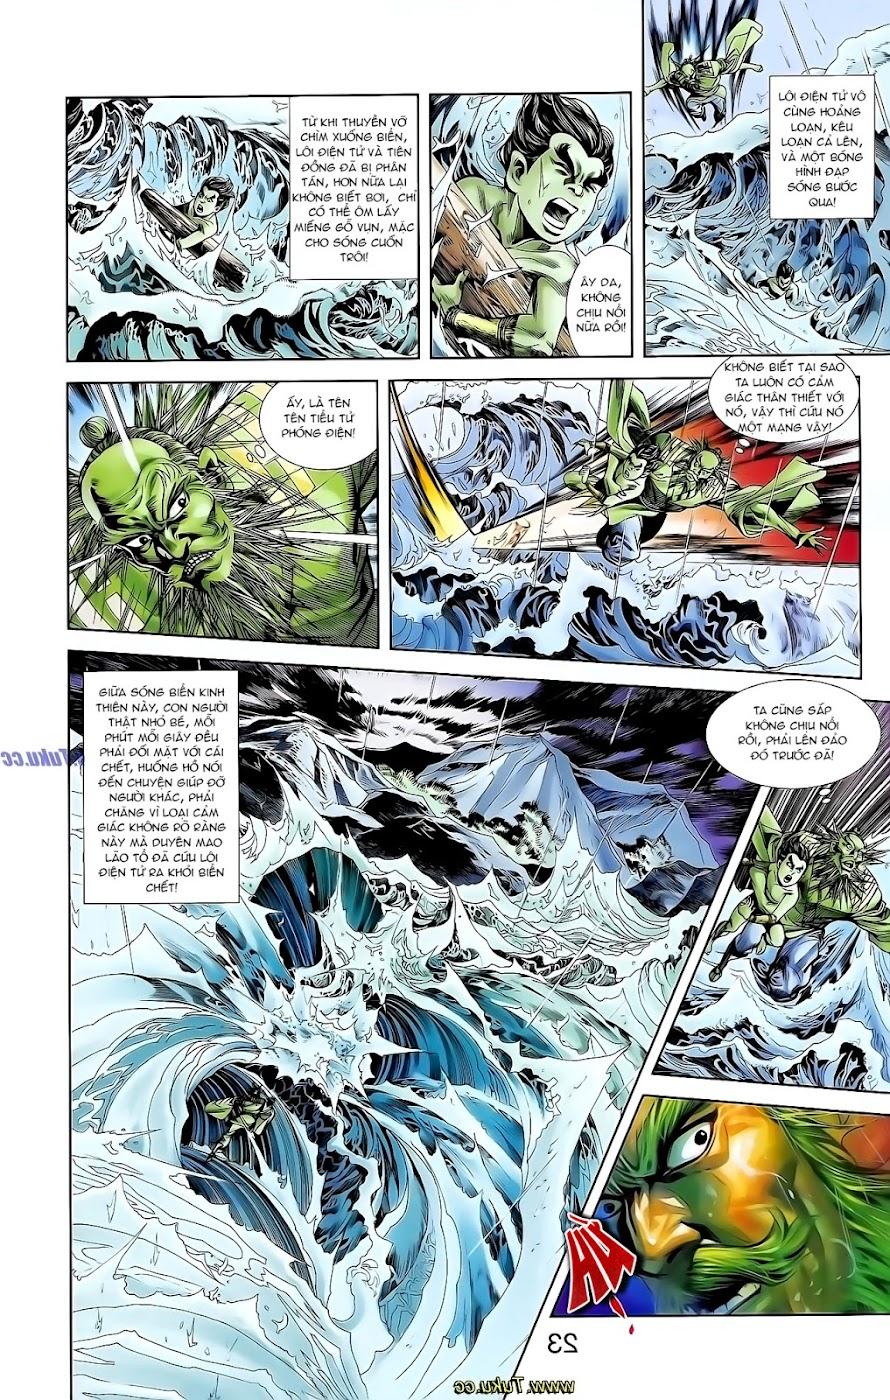 Thiên Tử Truyền Kỳ P1 Chap 129 - Next Chap 130 image 19